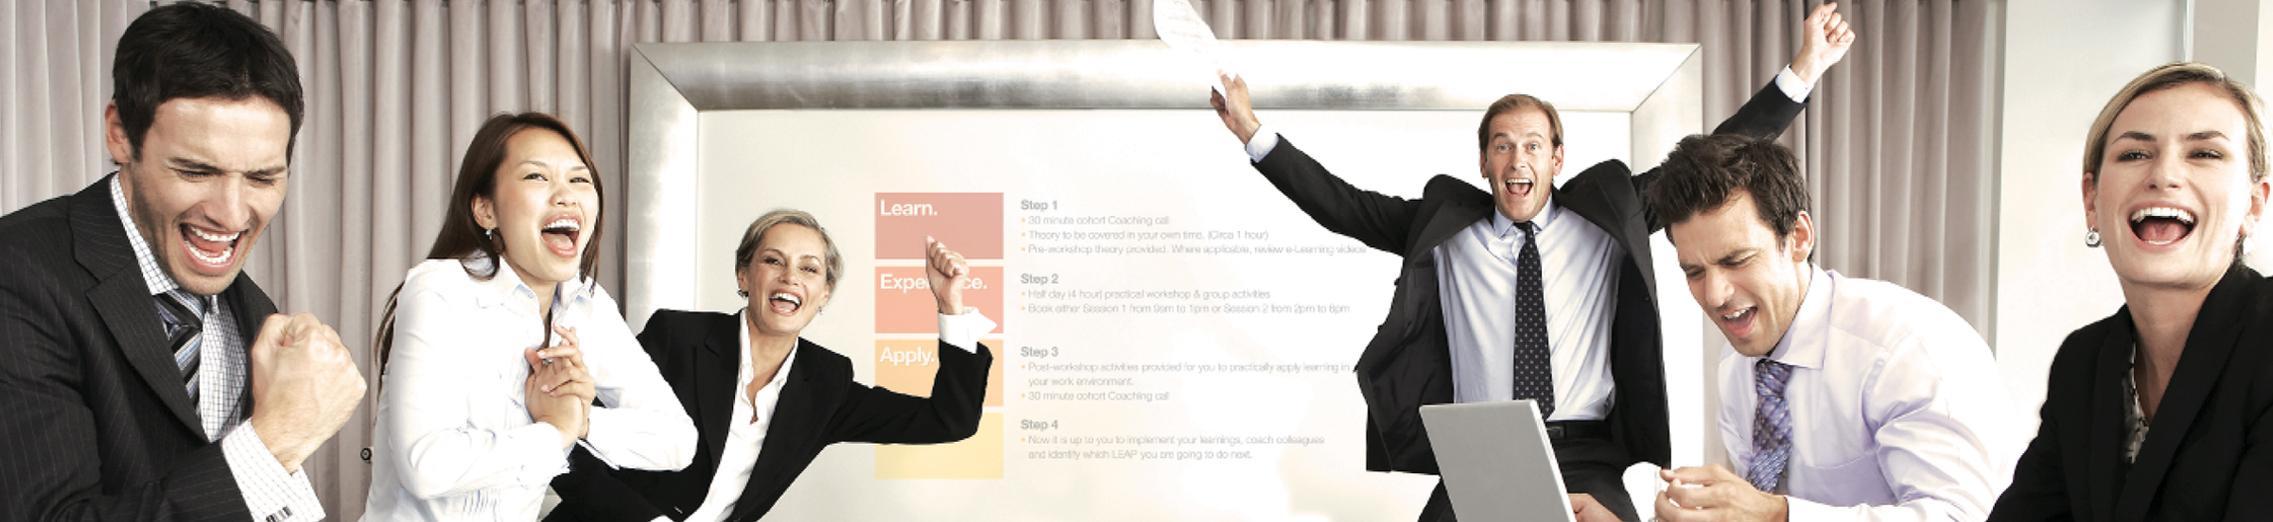 Academy of Procurement team success